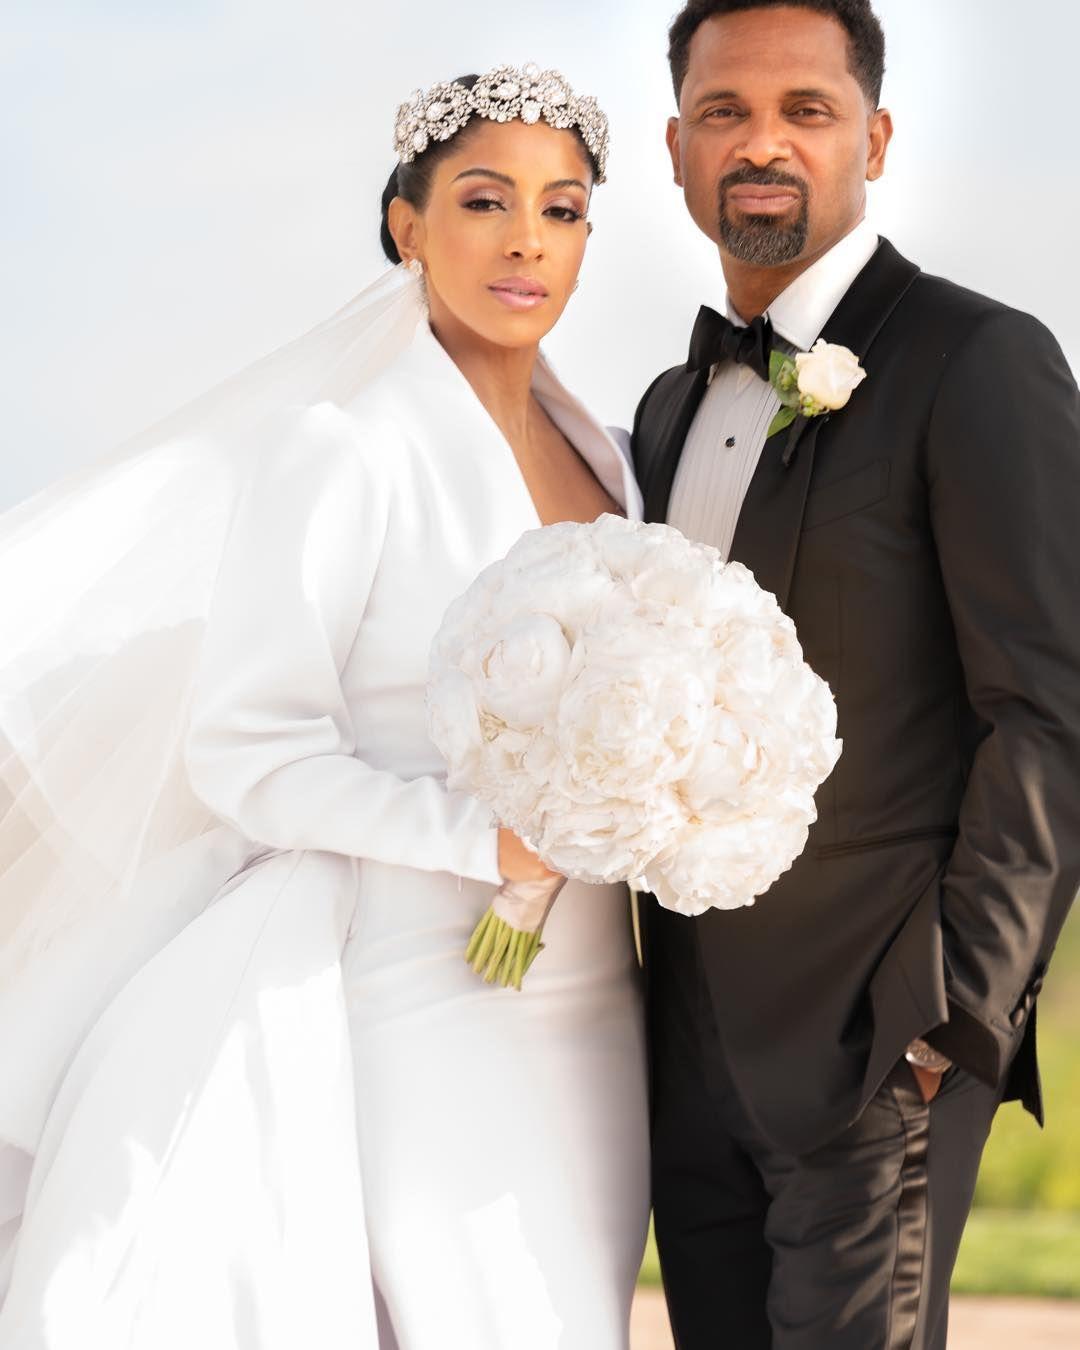 Mr Mrs Epps Kyraepps In The House 4sho Black Bride California Wedding Bride